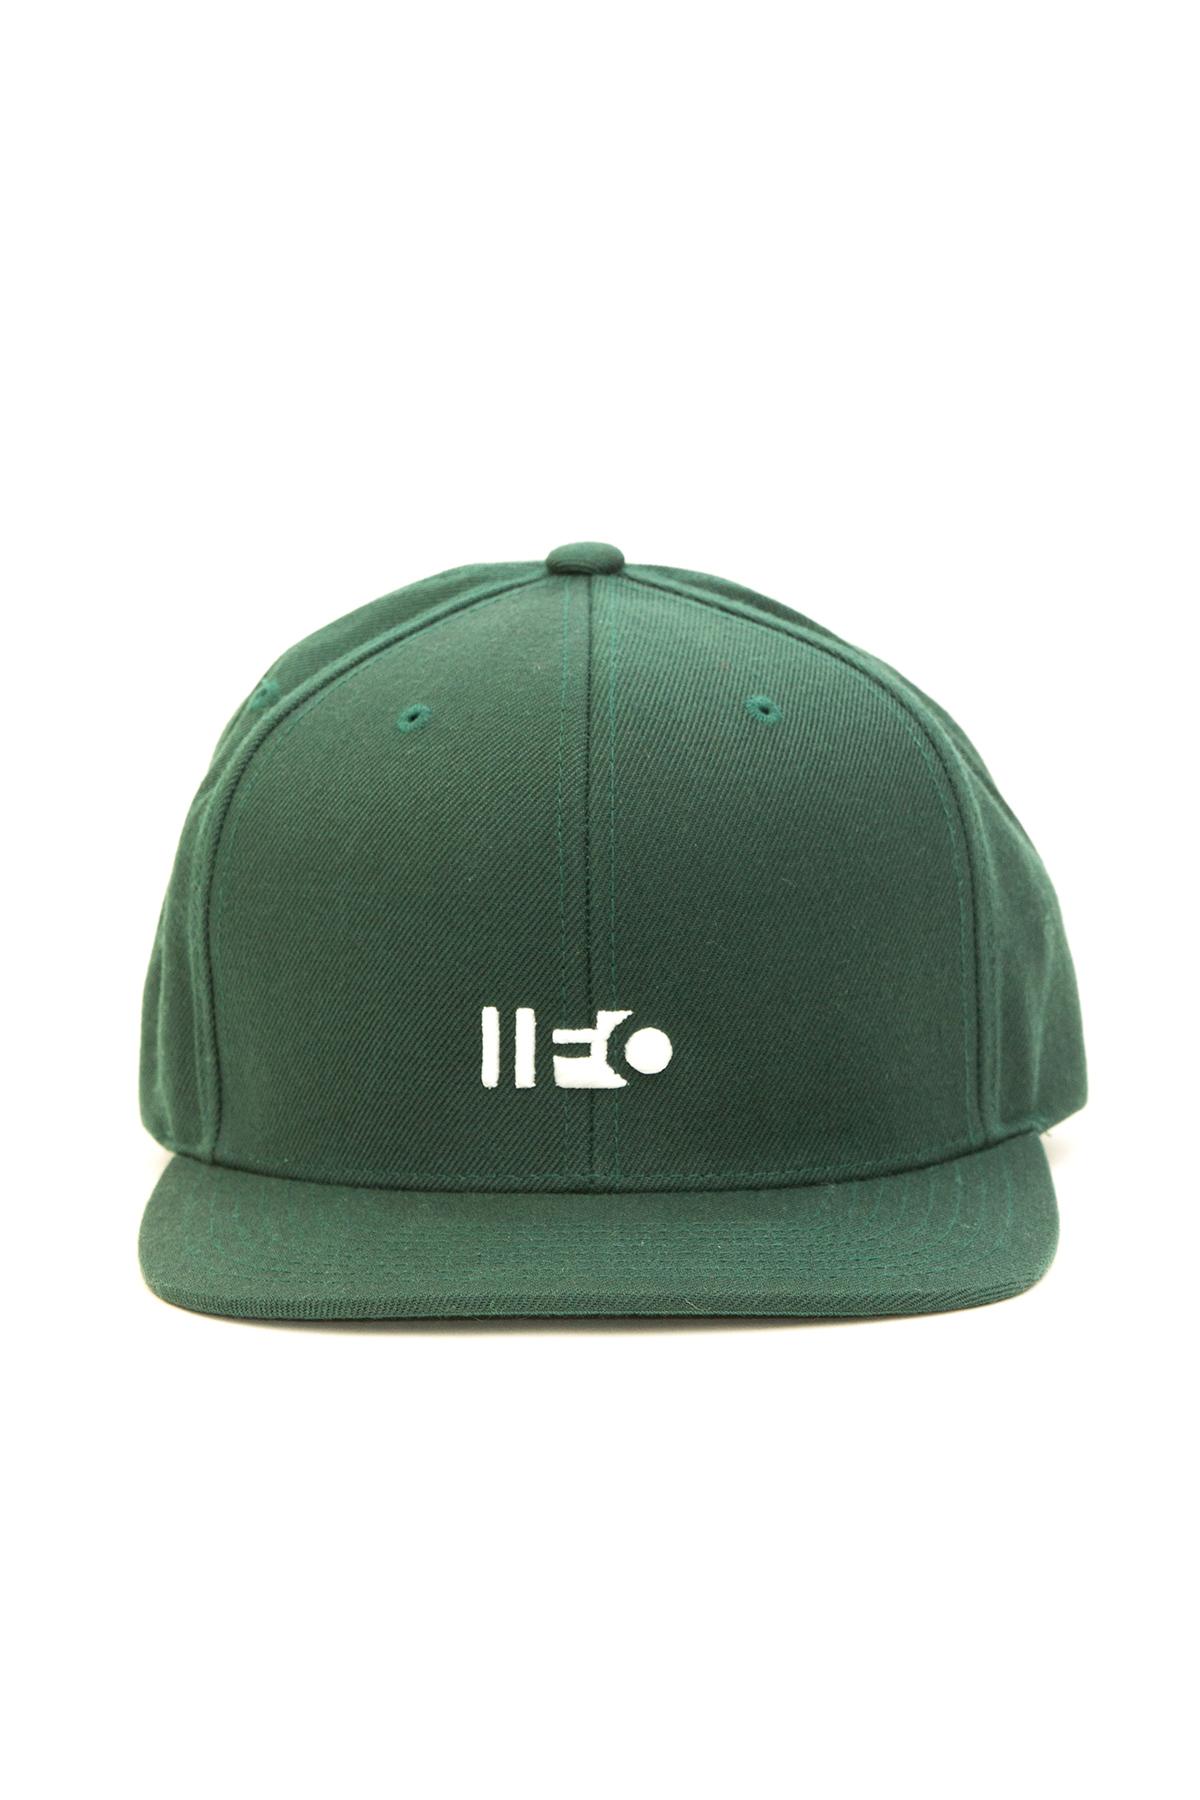 CUTOUT-LOGO-SNAPBACK-green_shop1